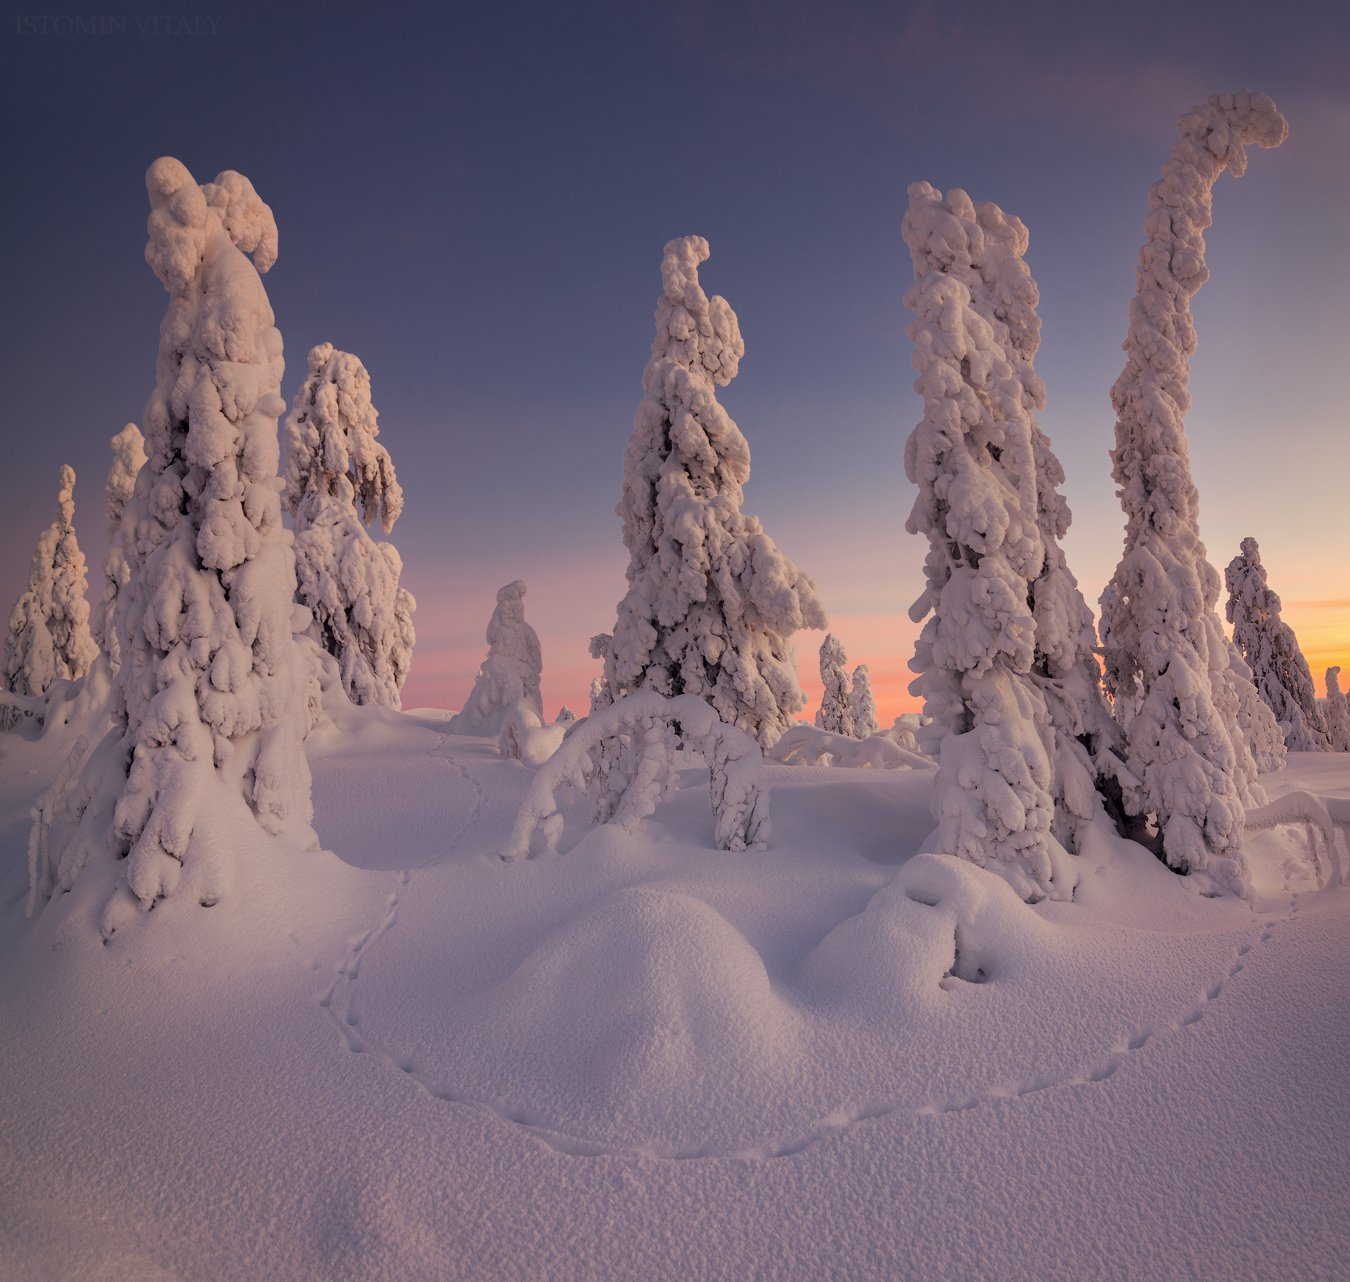 пейзаж,кандалакша,зима,снег,следы,лес,закат,небо,красиво,панорама,колський север, Истомин Виталий